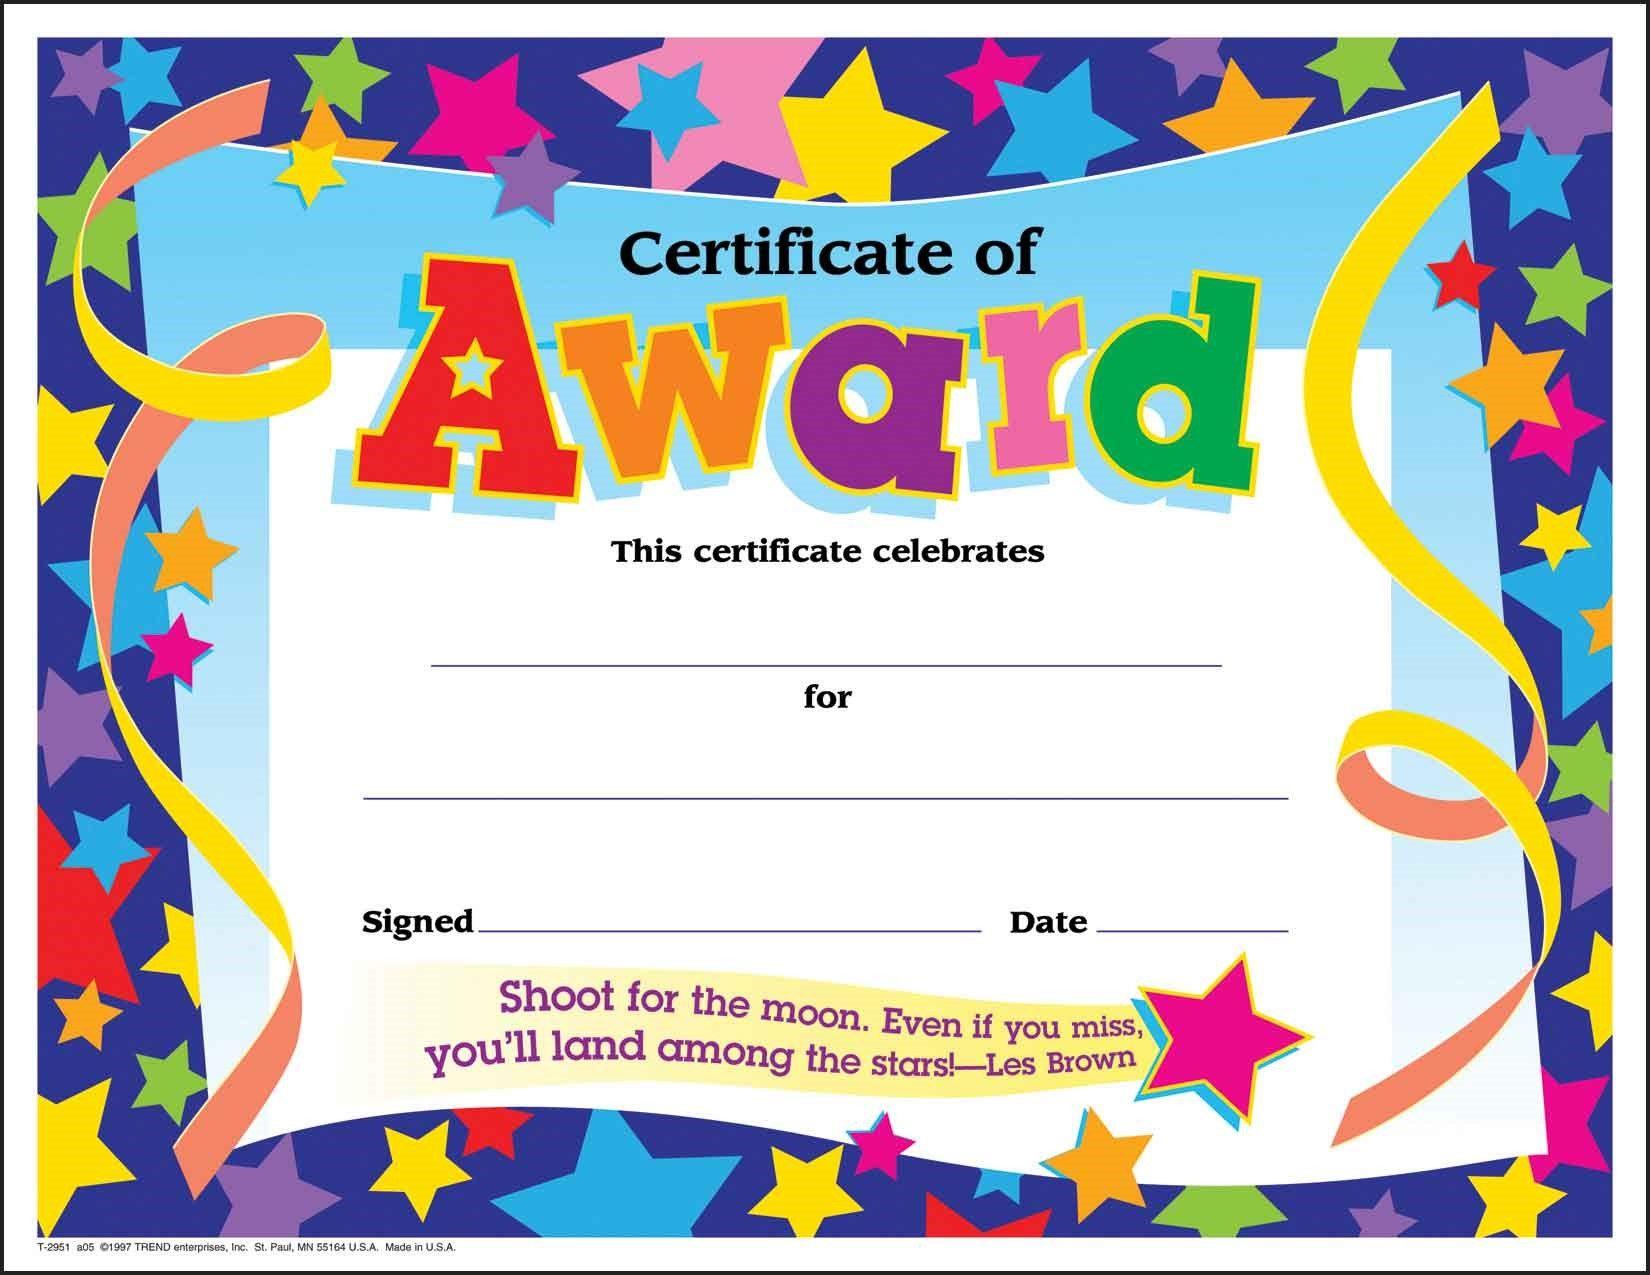 Award Certificates | Printable Award Certificate Templates | Dog - Free Printable Certificates And Awards